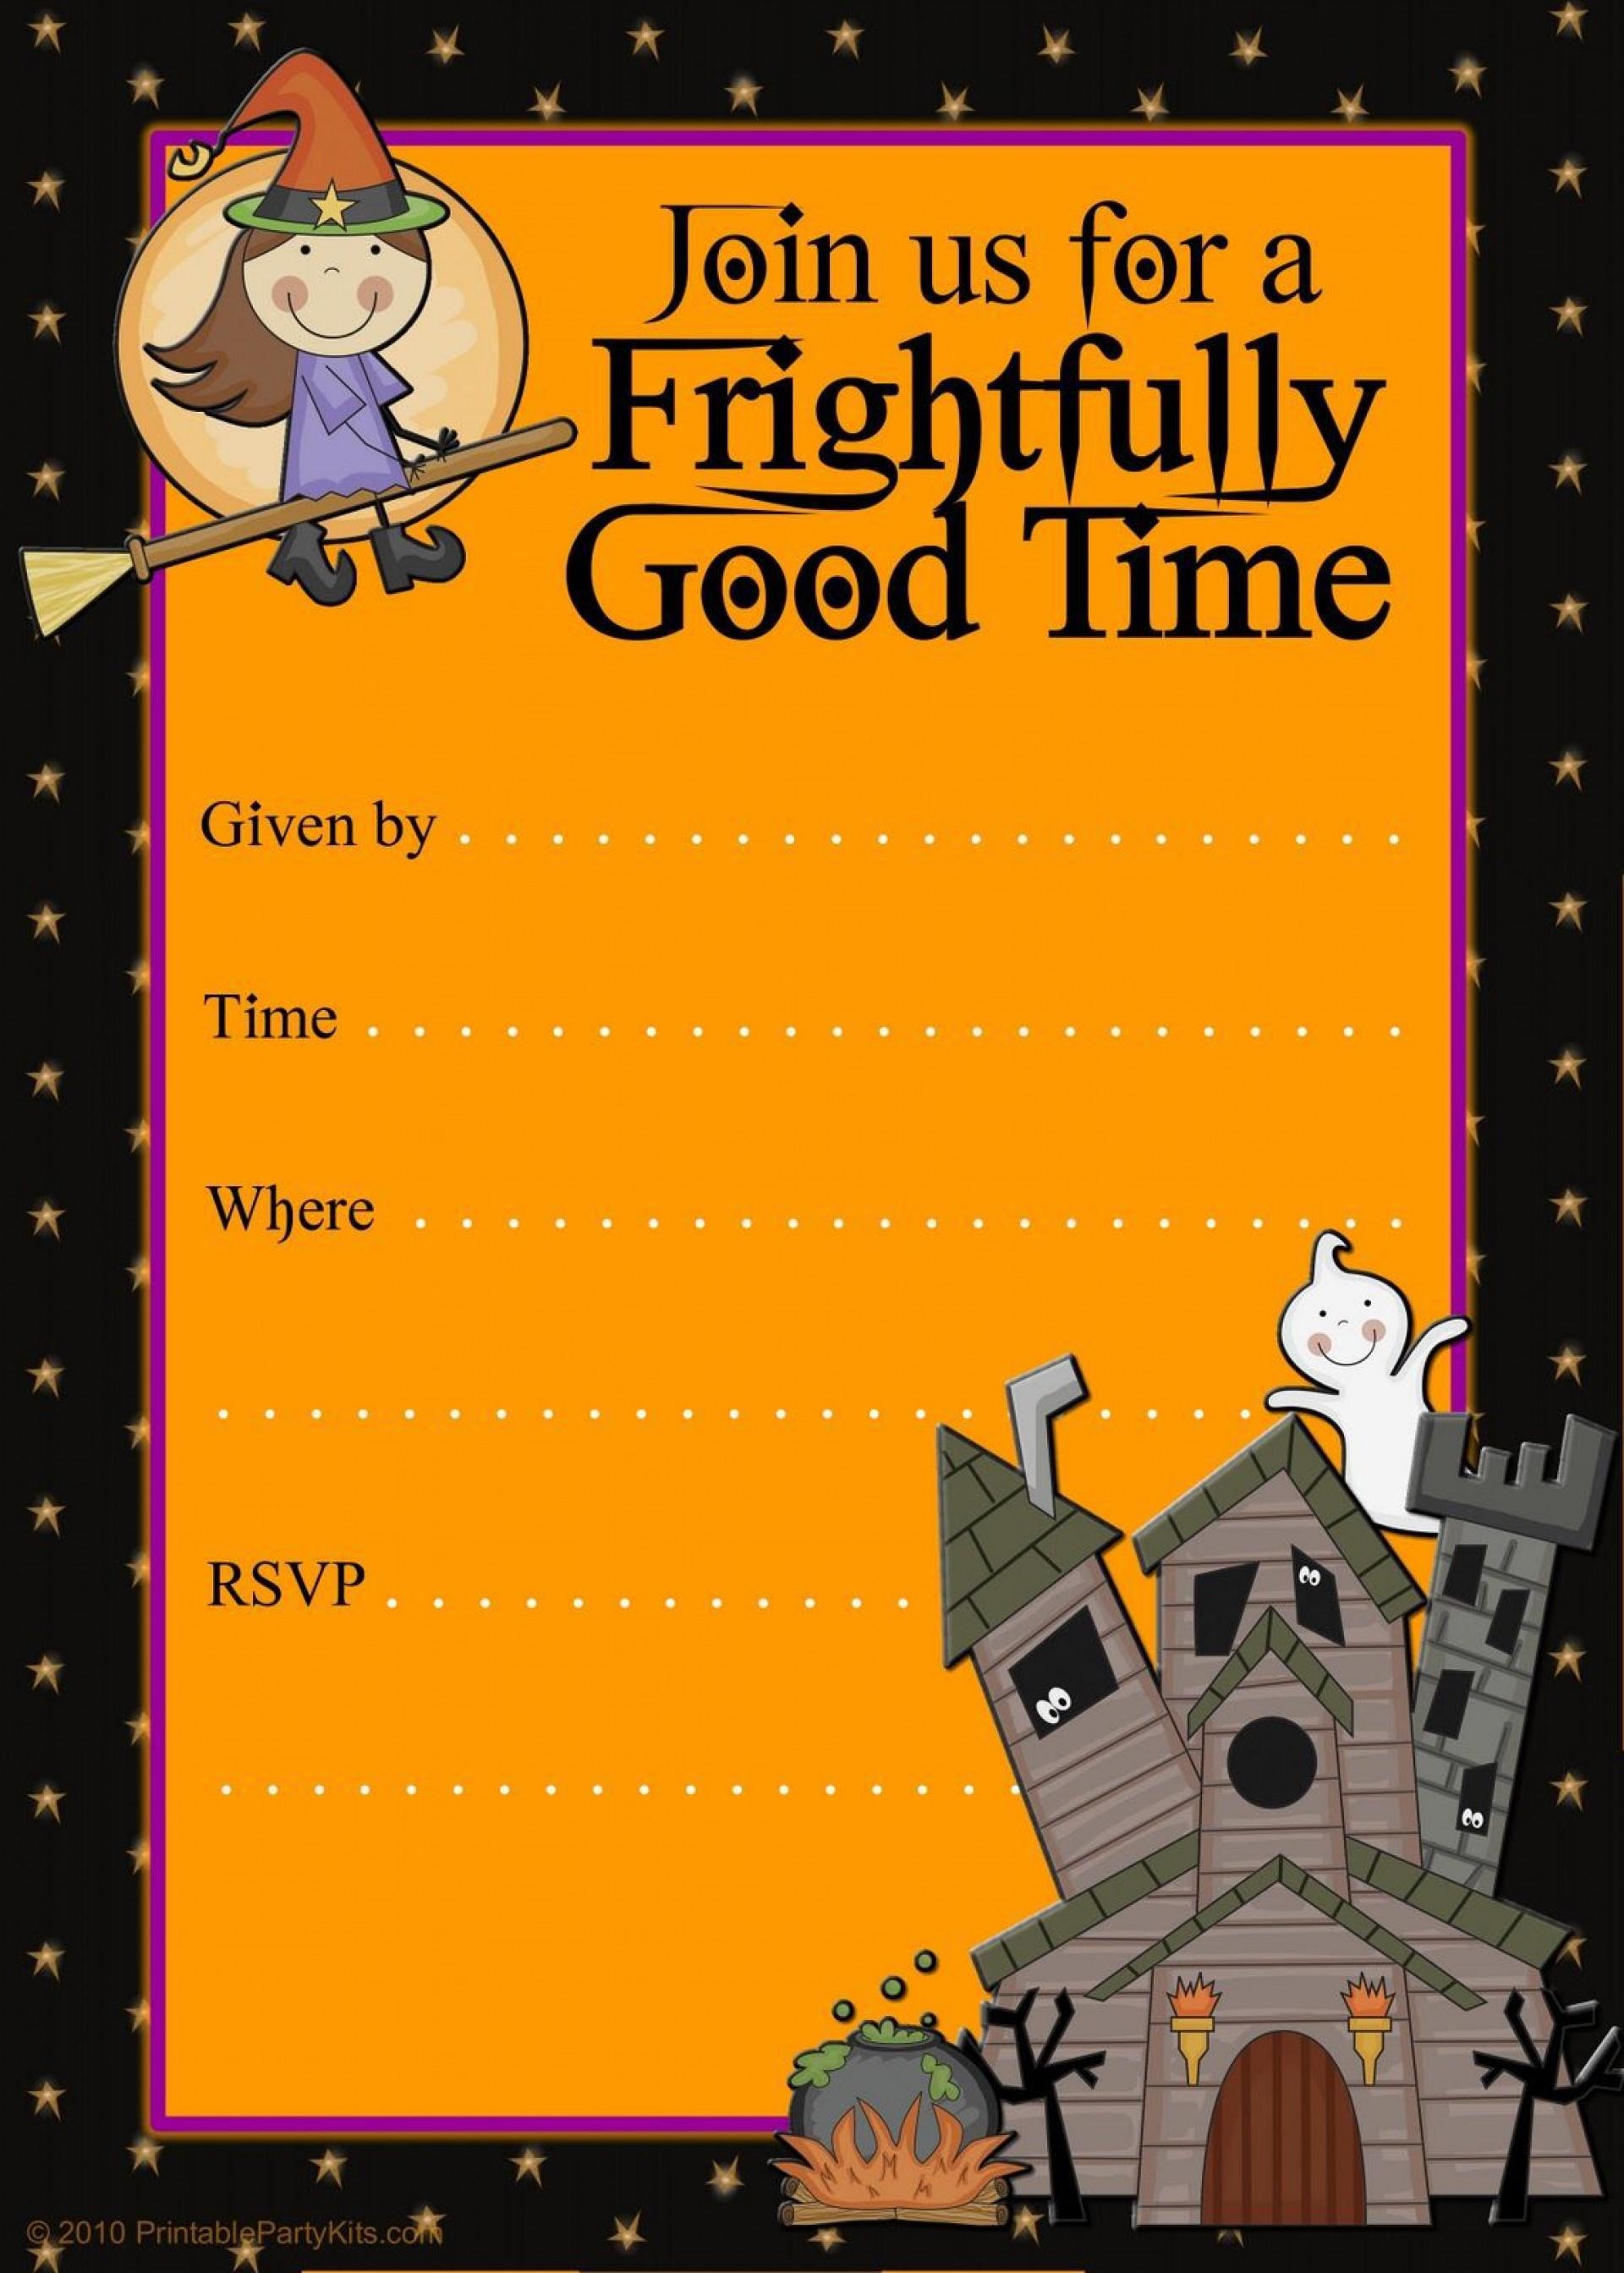 002 Sensational Halloween Party Invitation Template High Def  Microsoft Block October1920